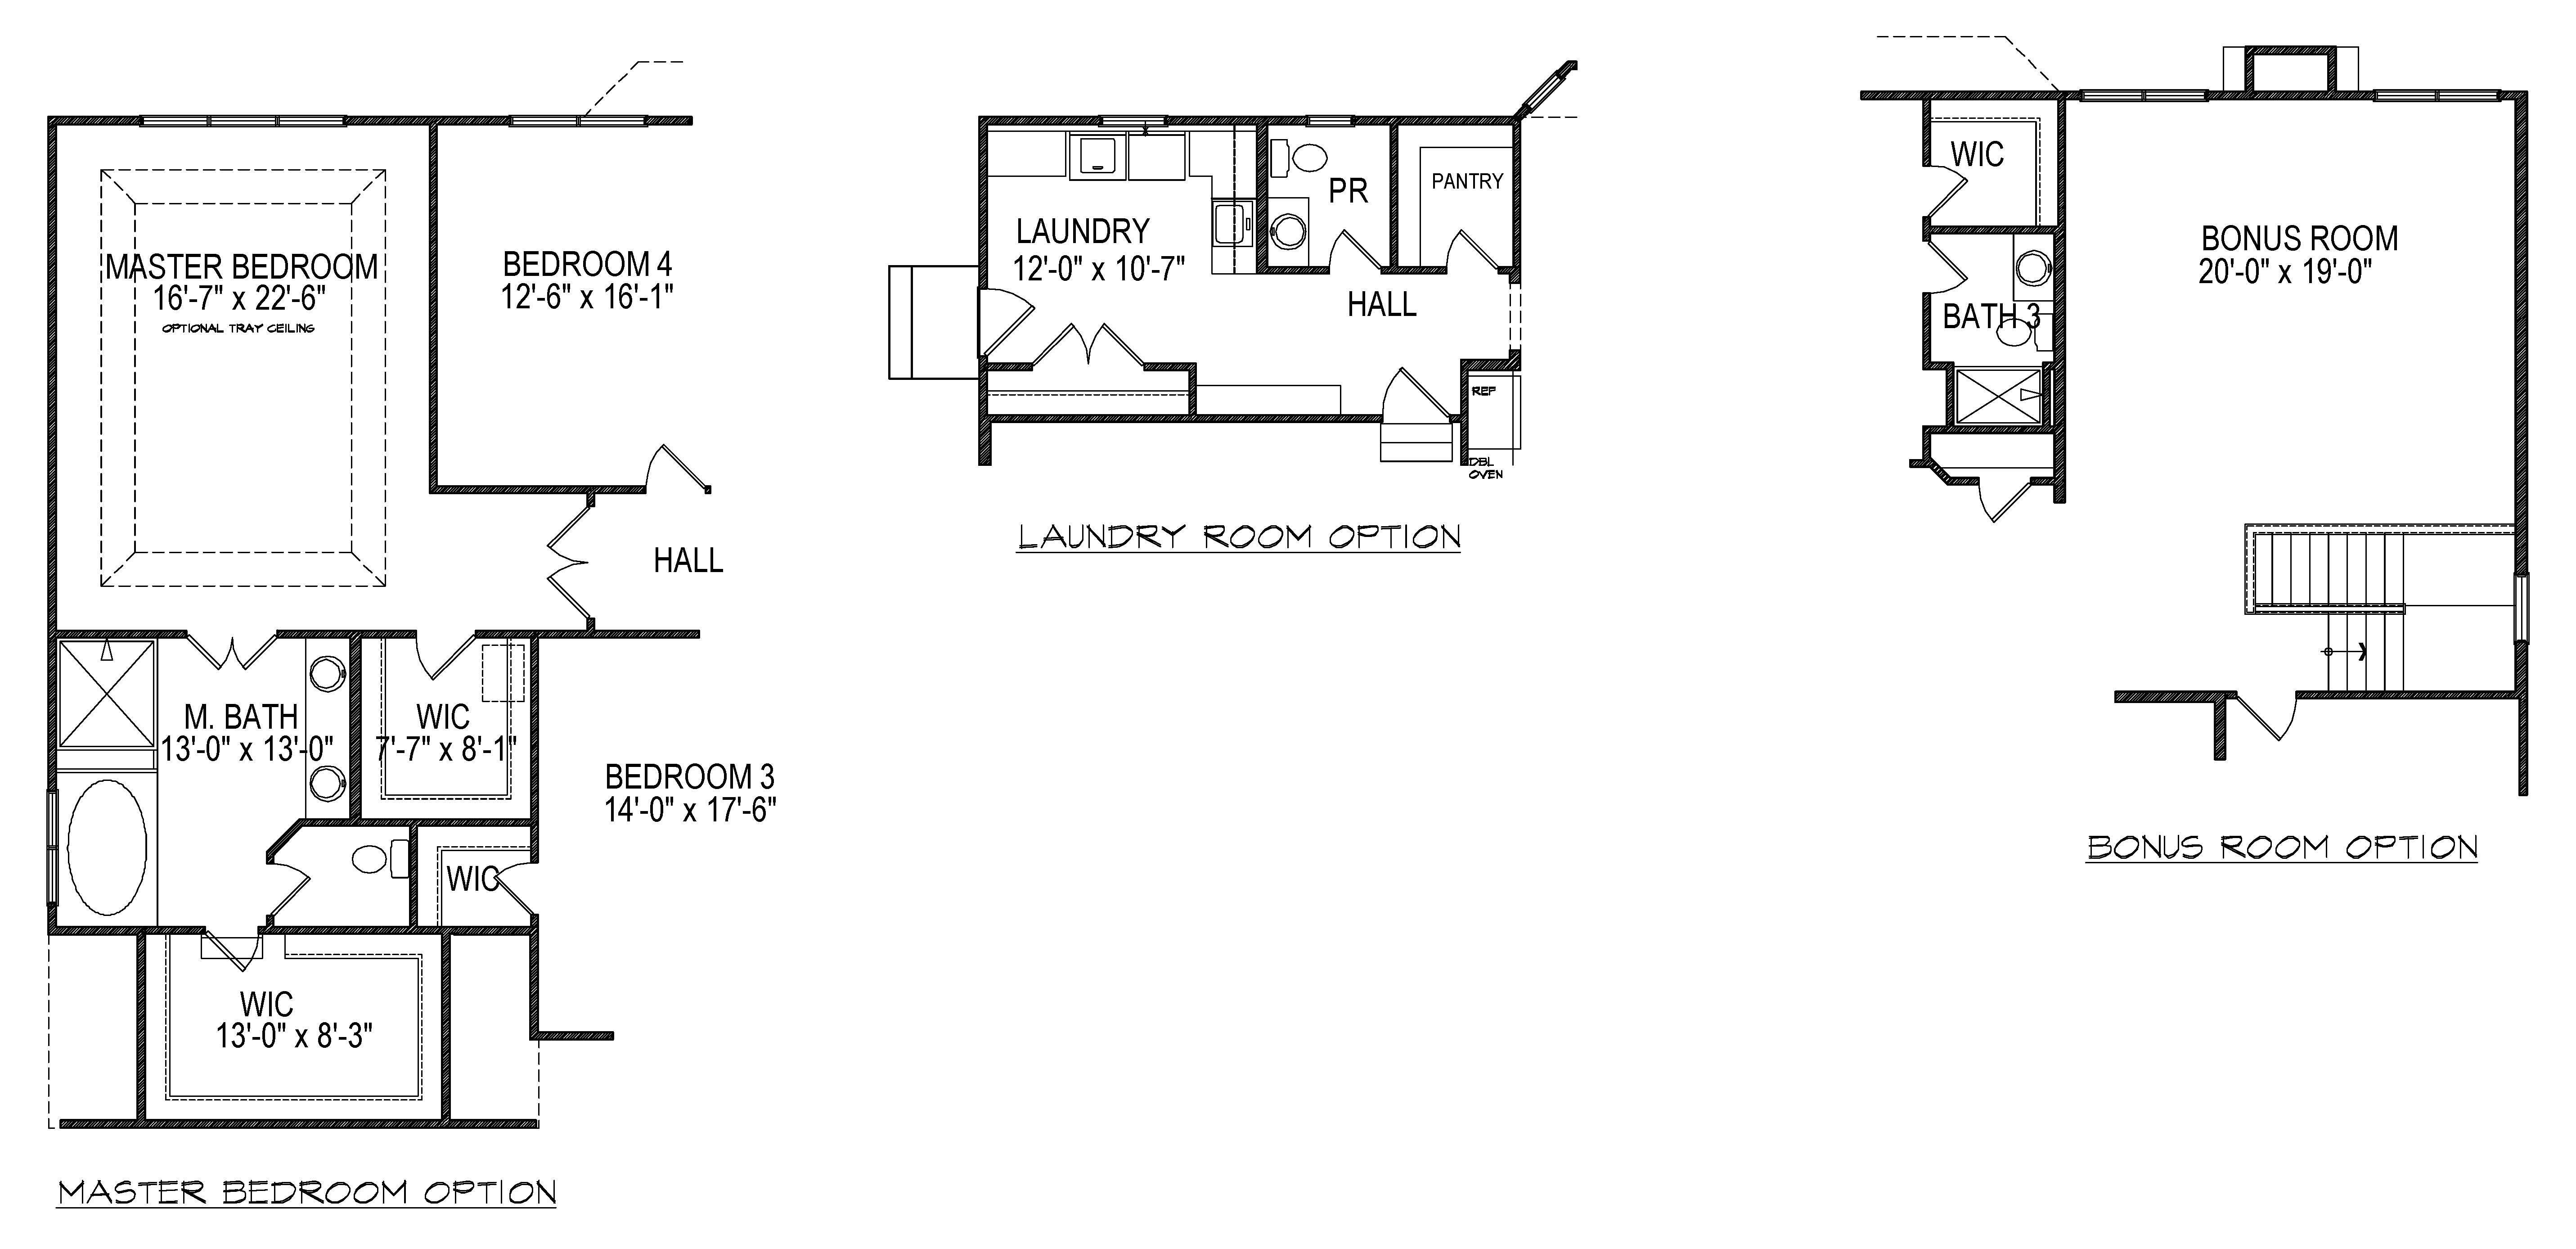 laundry room layout tool